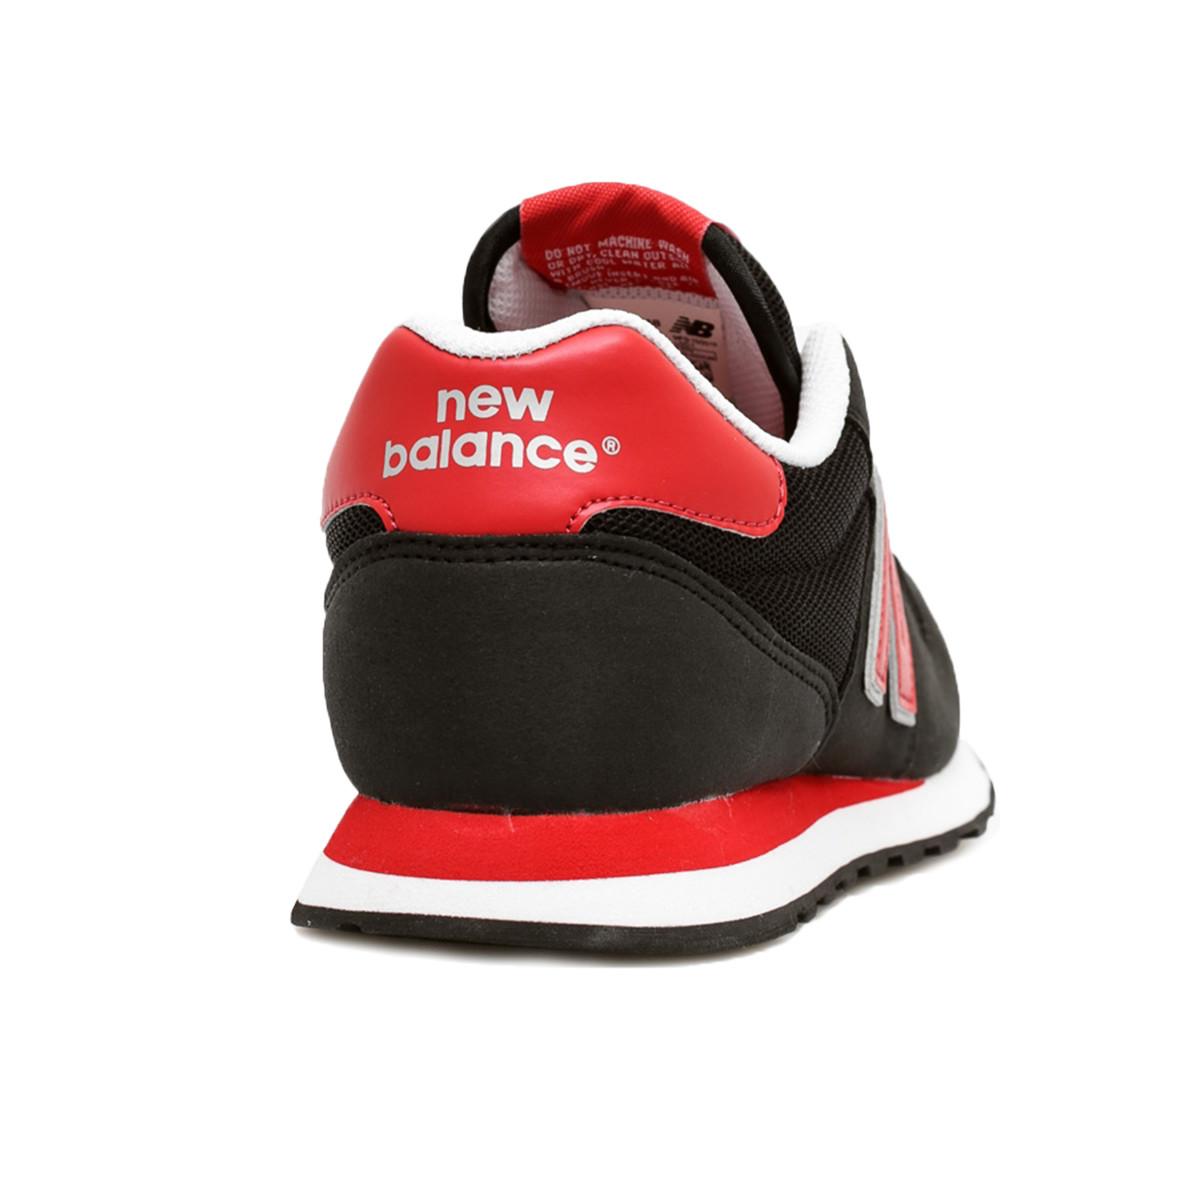 chaussure new balance femme promo